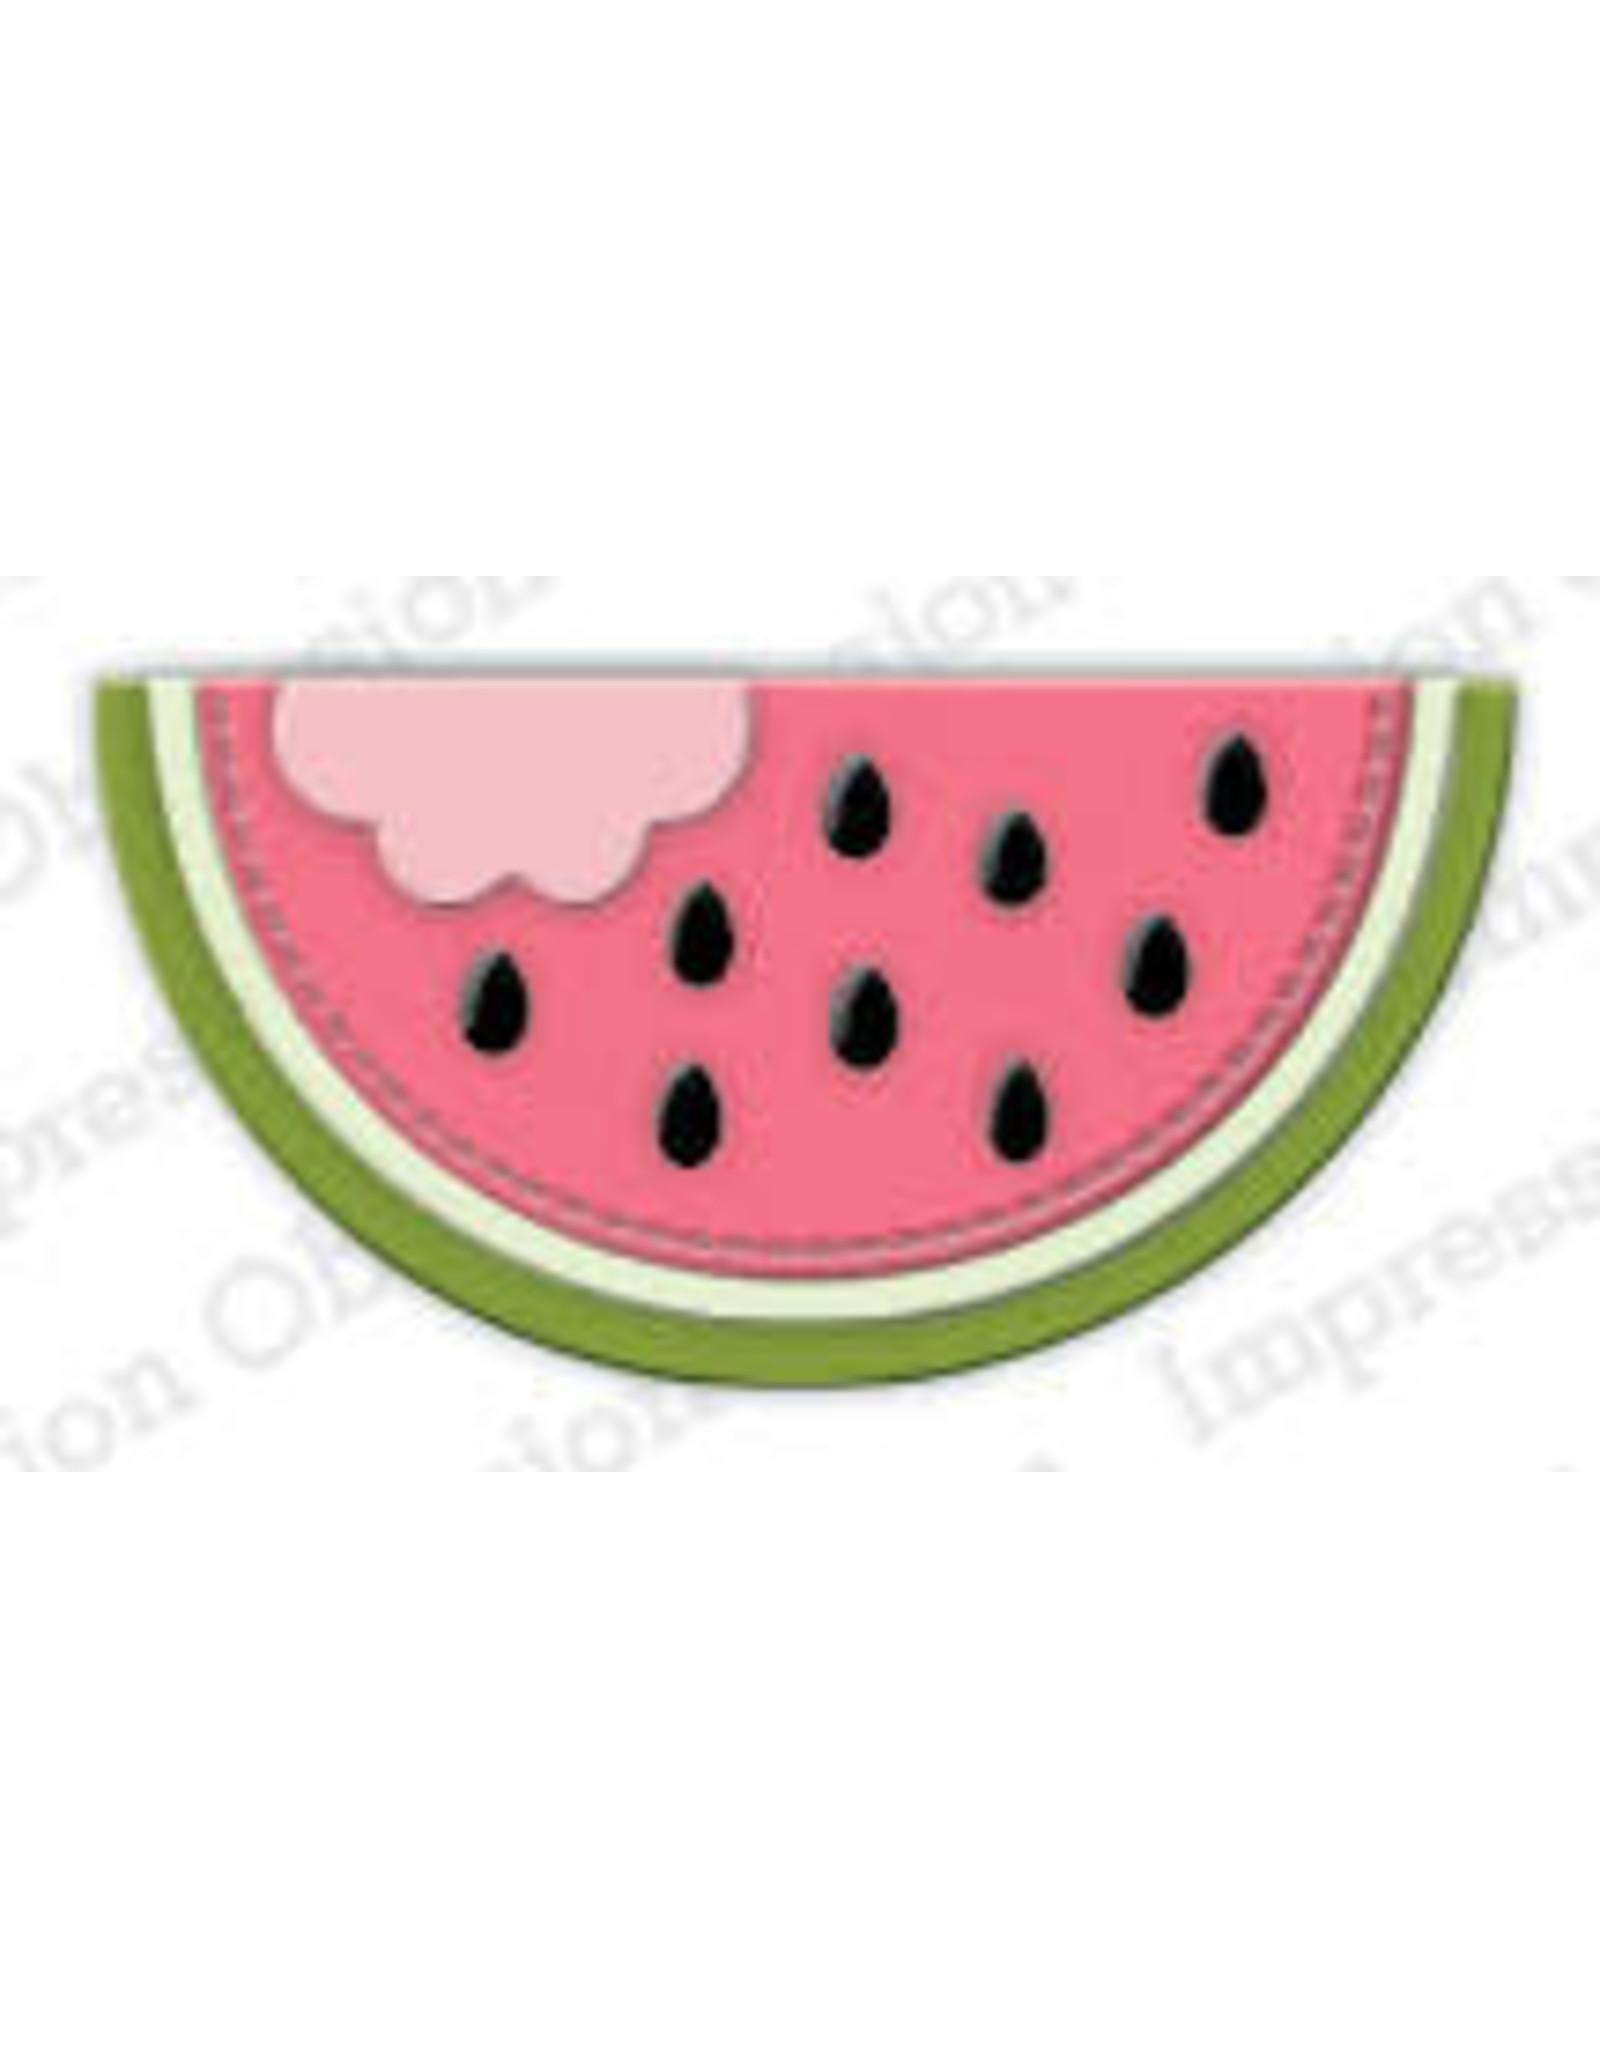 Impression Obsession Melon Slice Die (IO)